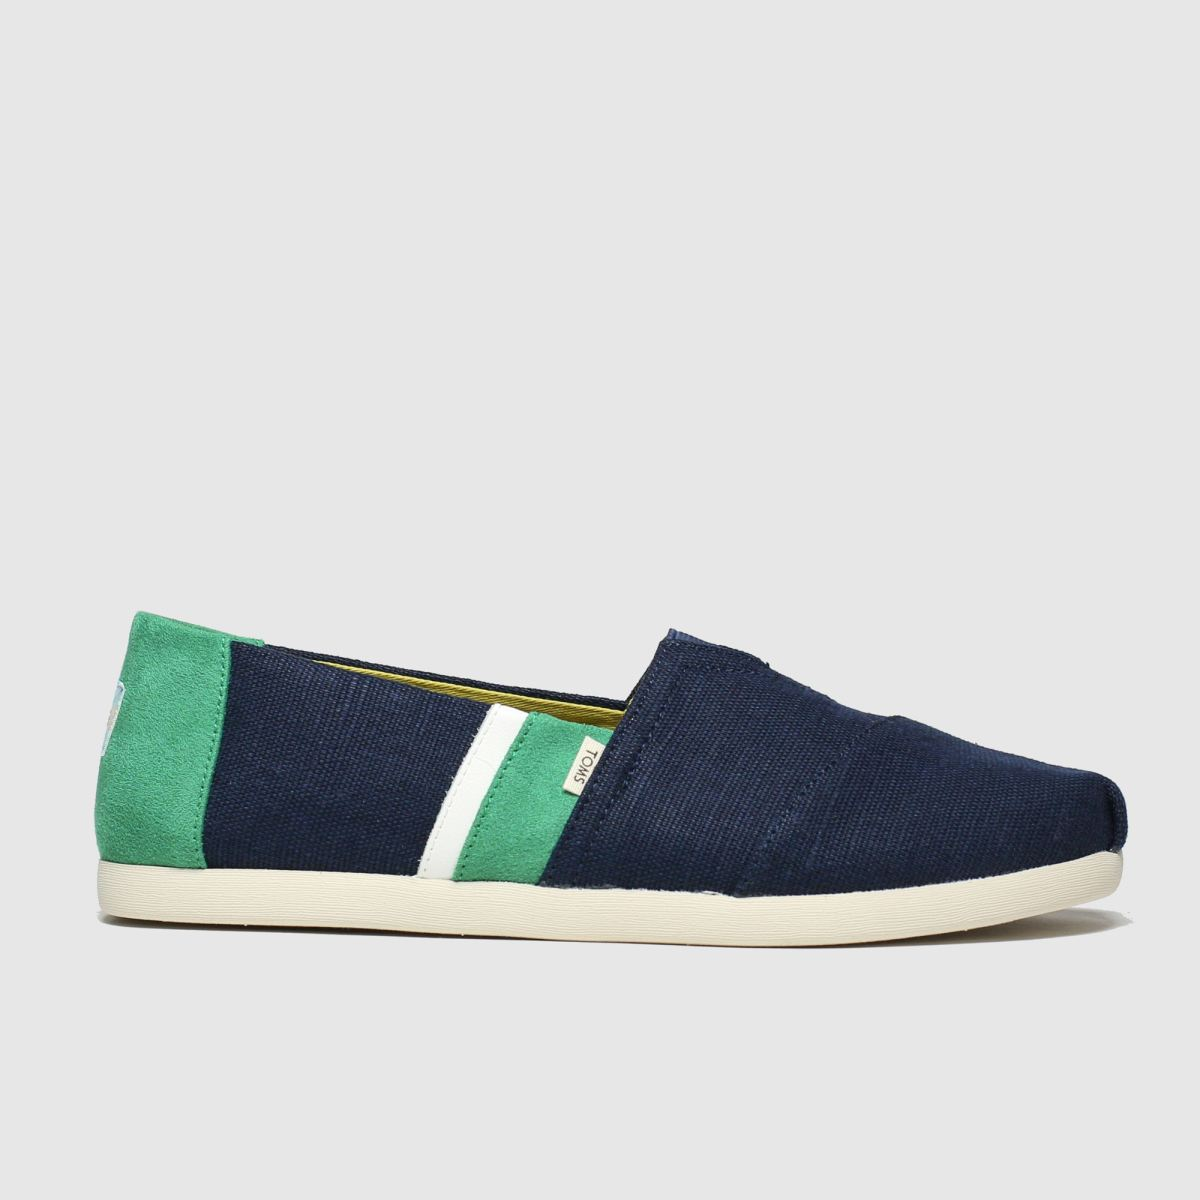 Toms Navy & Green Alpargata 3.0 Shoes